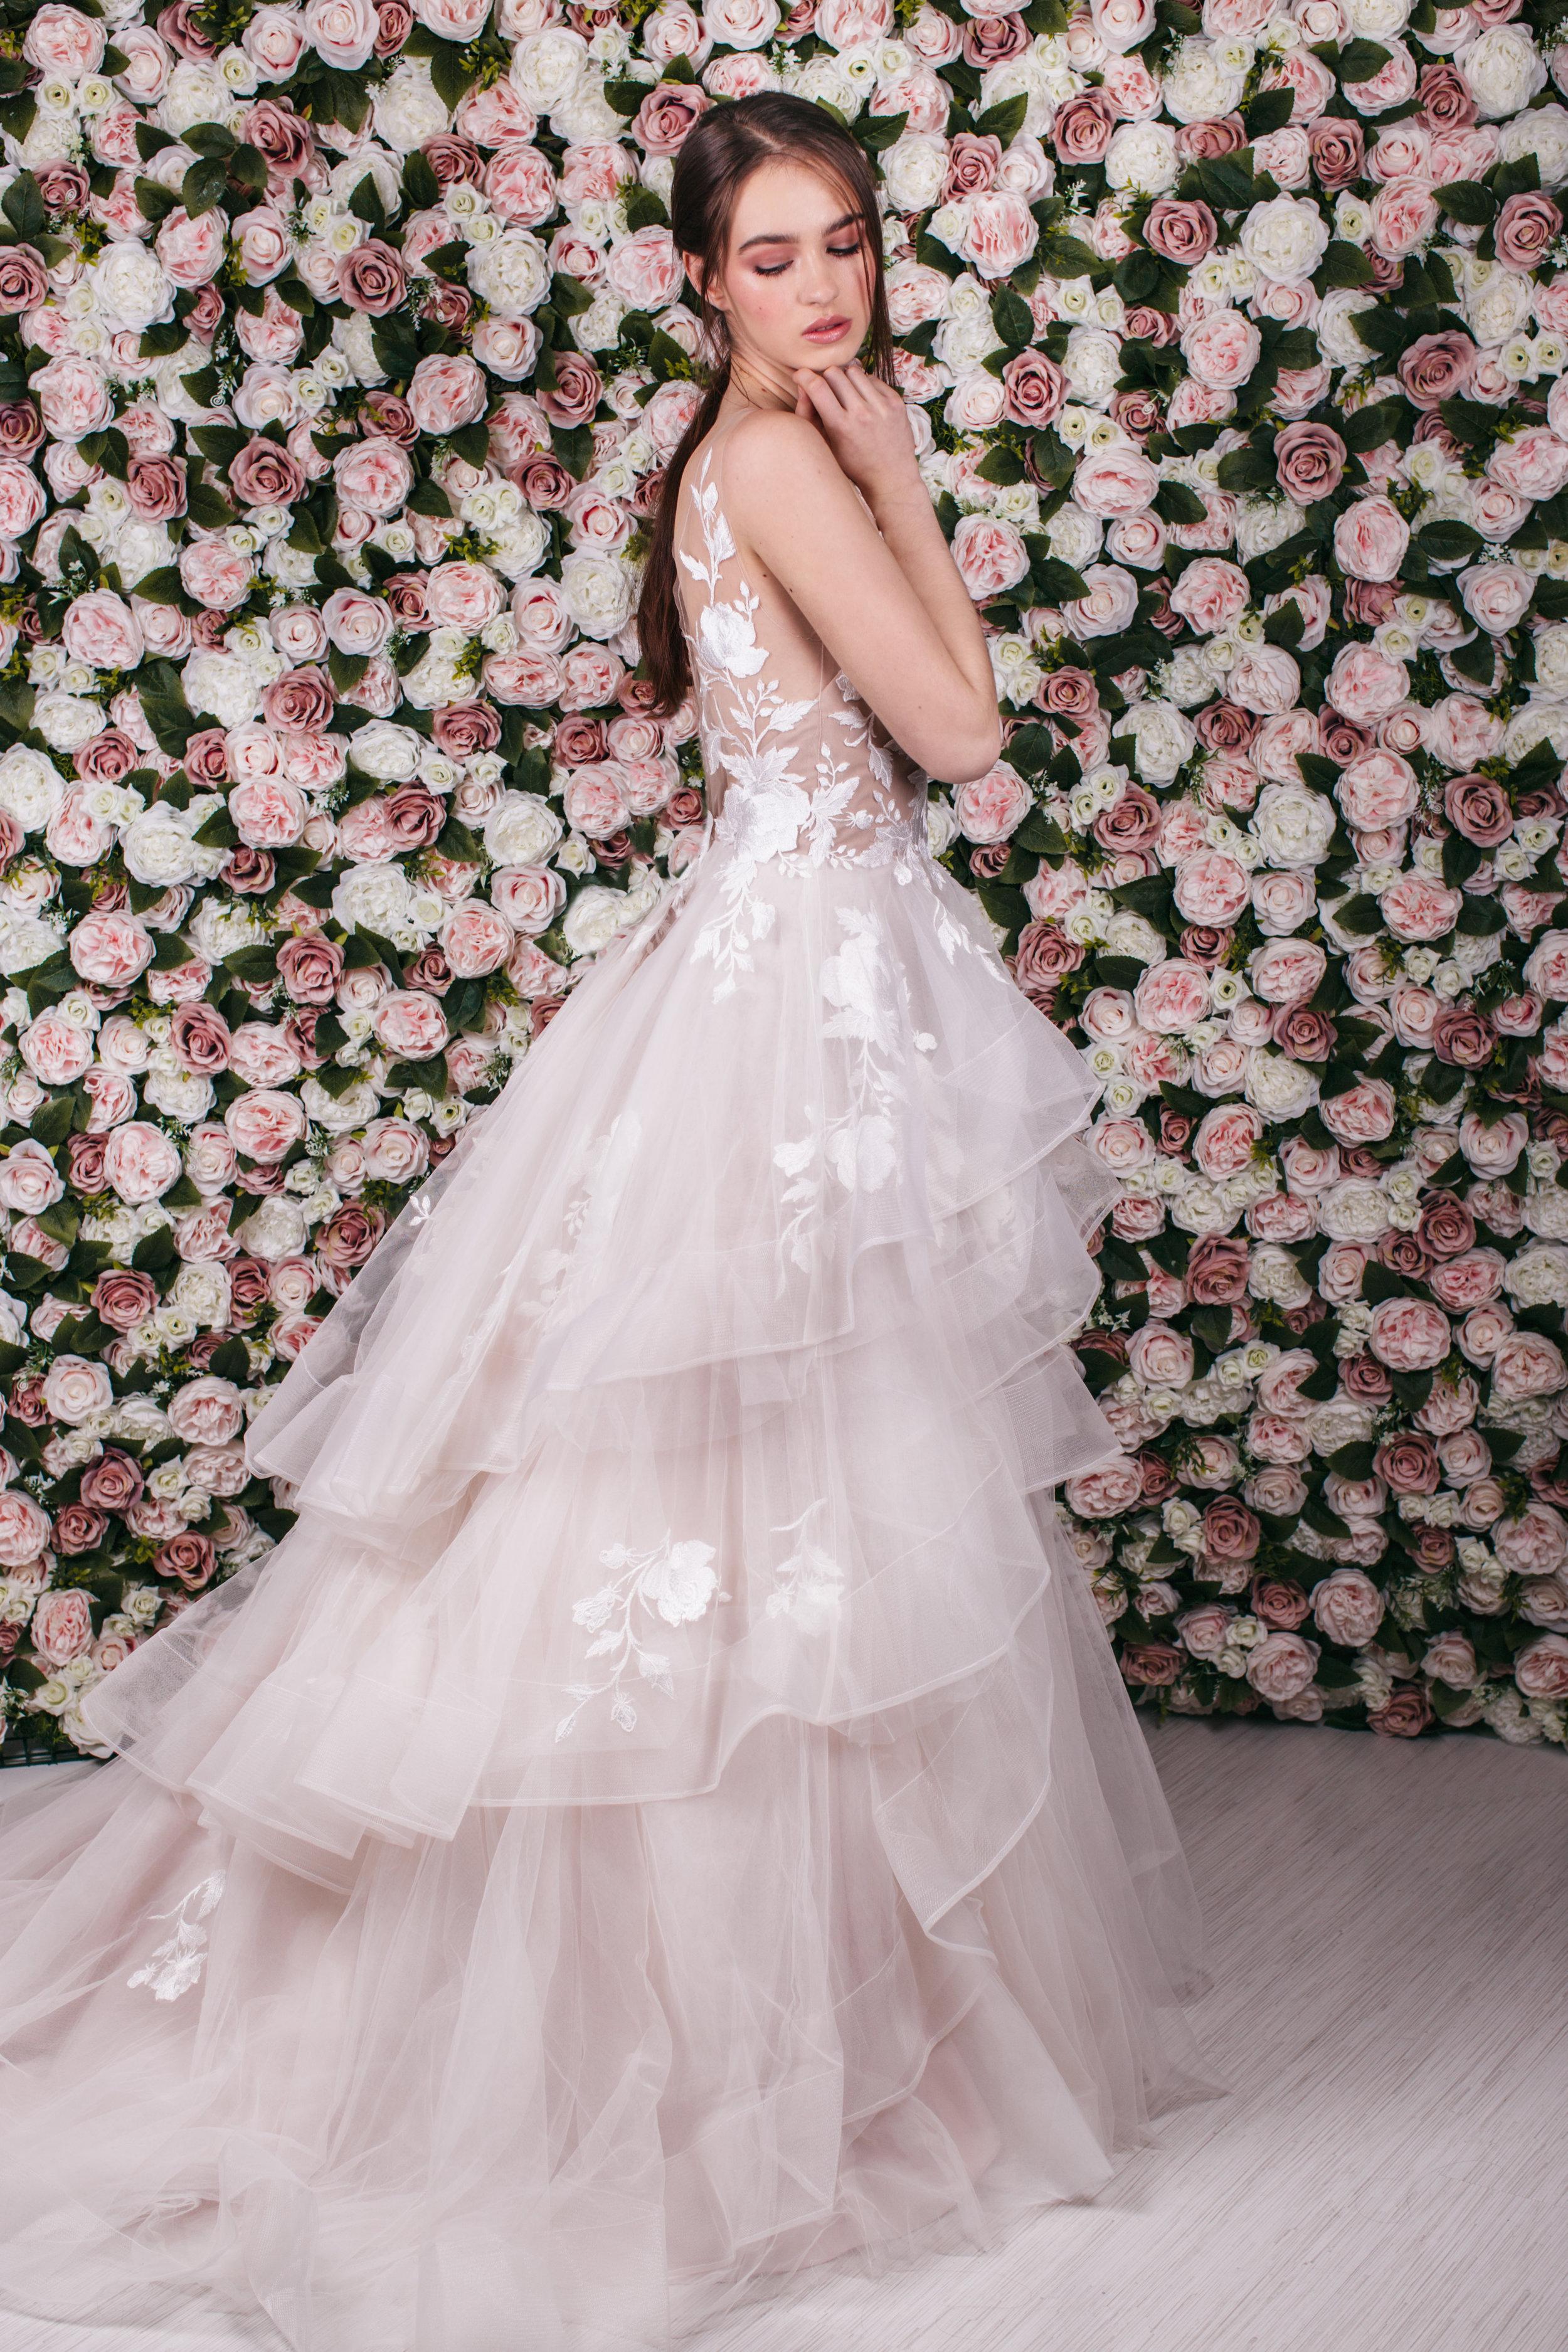 emma barrow flora hello petal your devon and cornwall wedding magazine wtoo